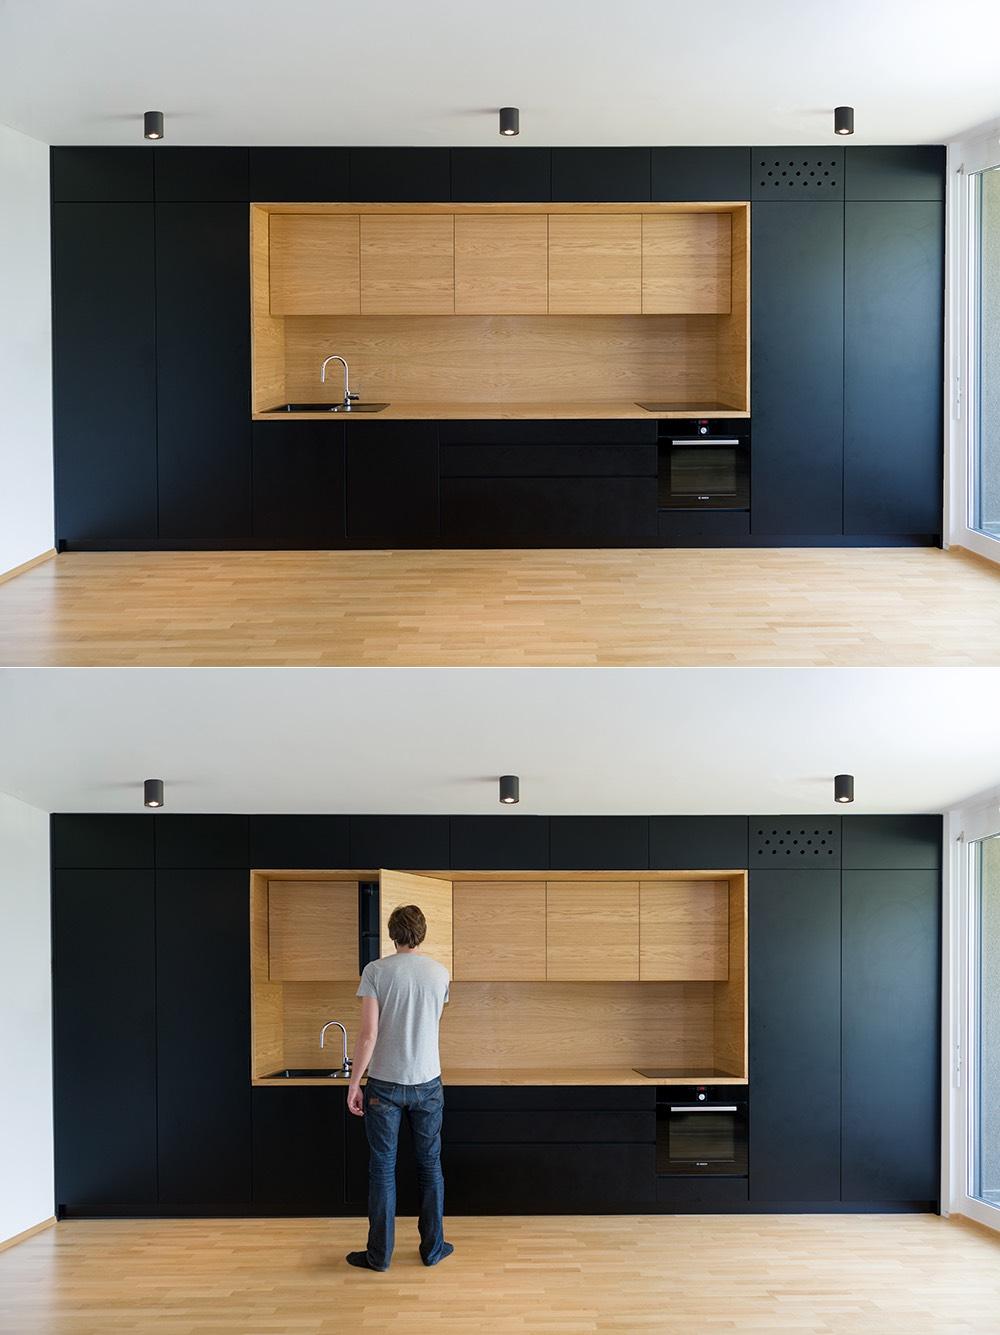 black white wood kitchens ideas inspiration designing kitchen kitchen decor design ideas